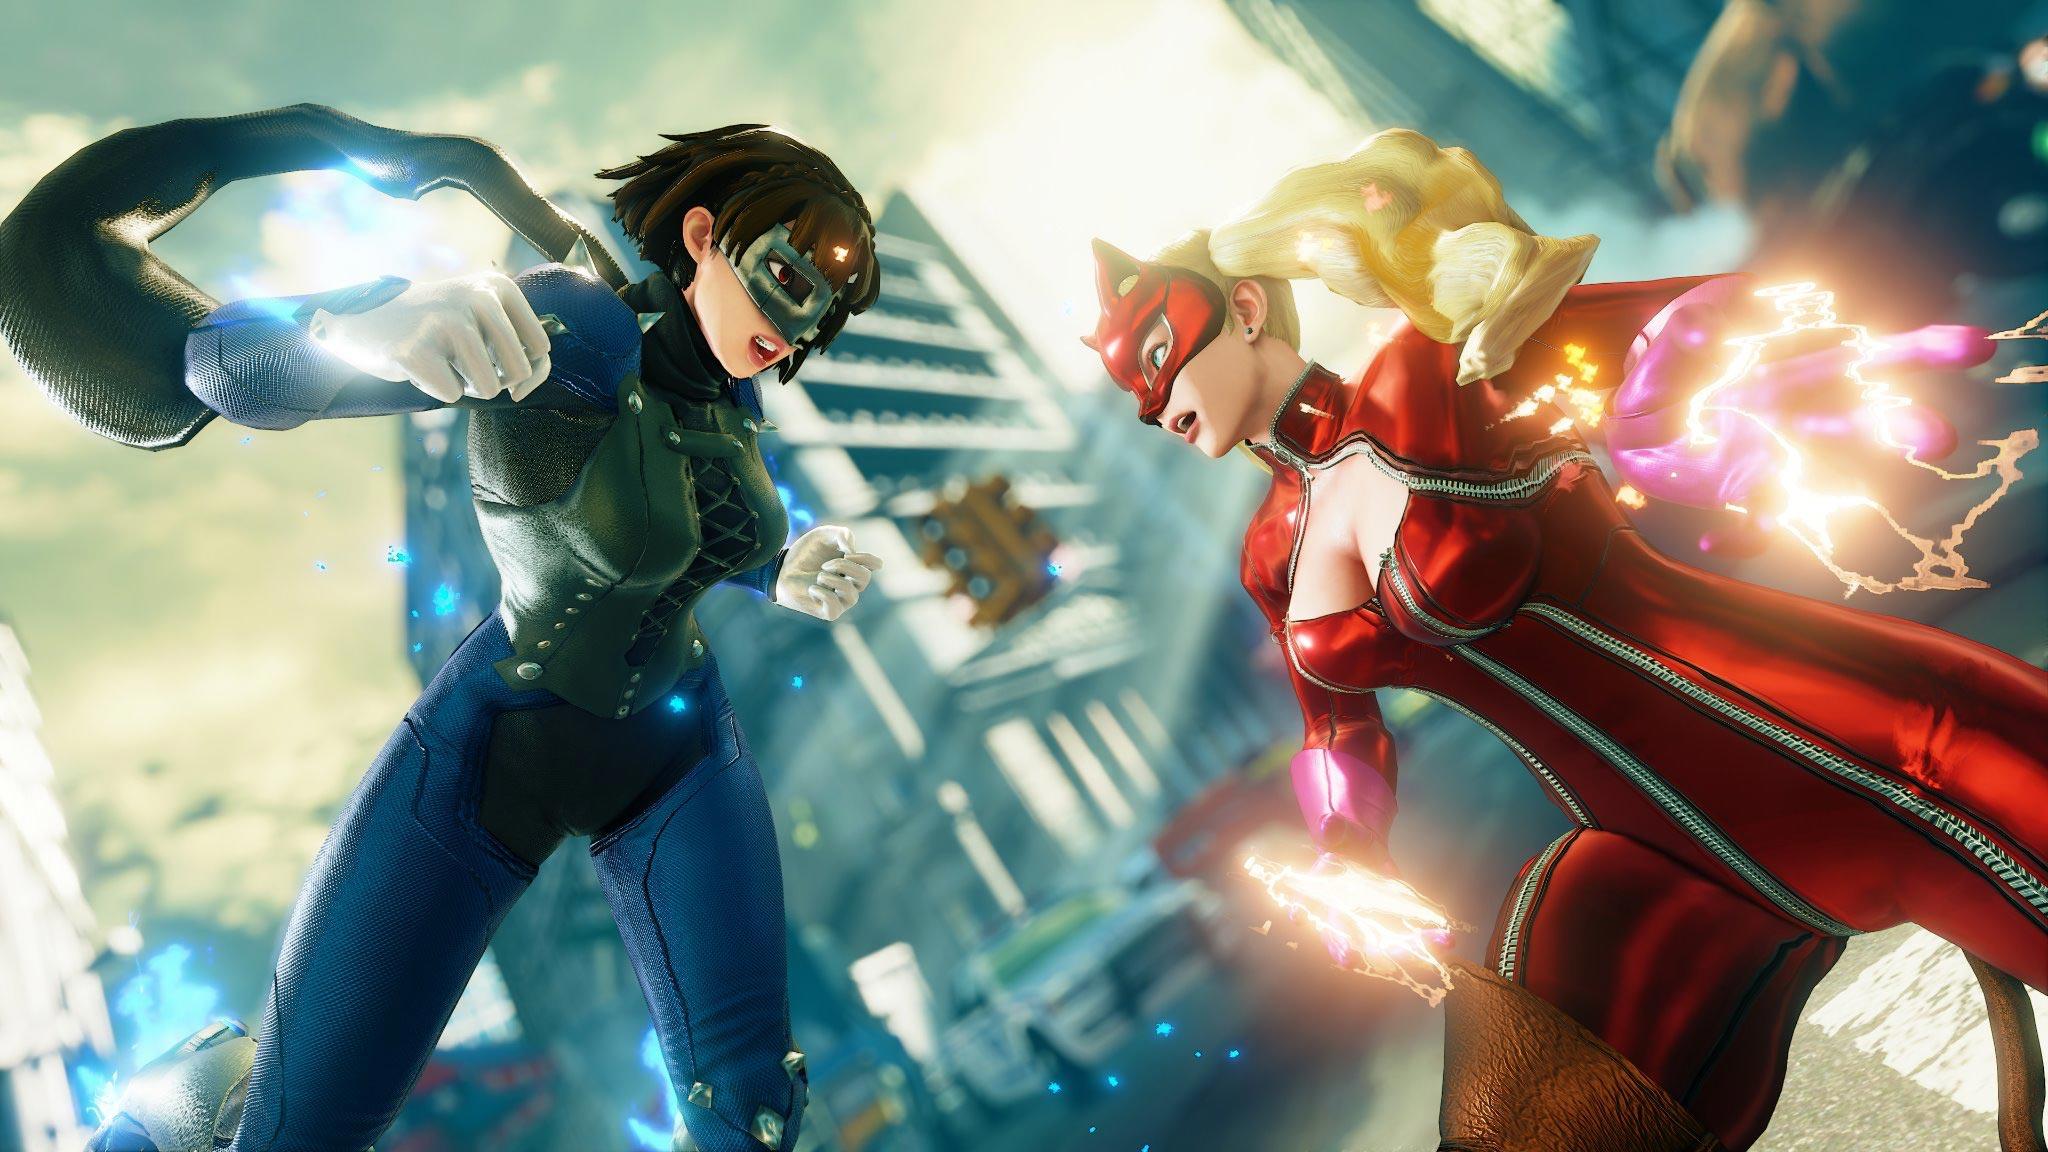 Eden's Street Fighter stills 2 out of 12 image gallery